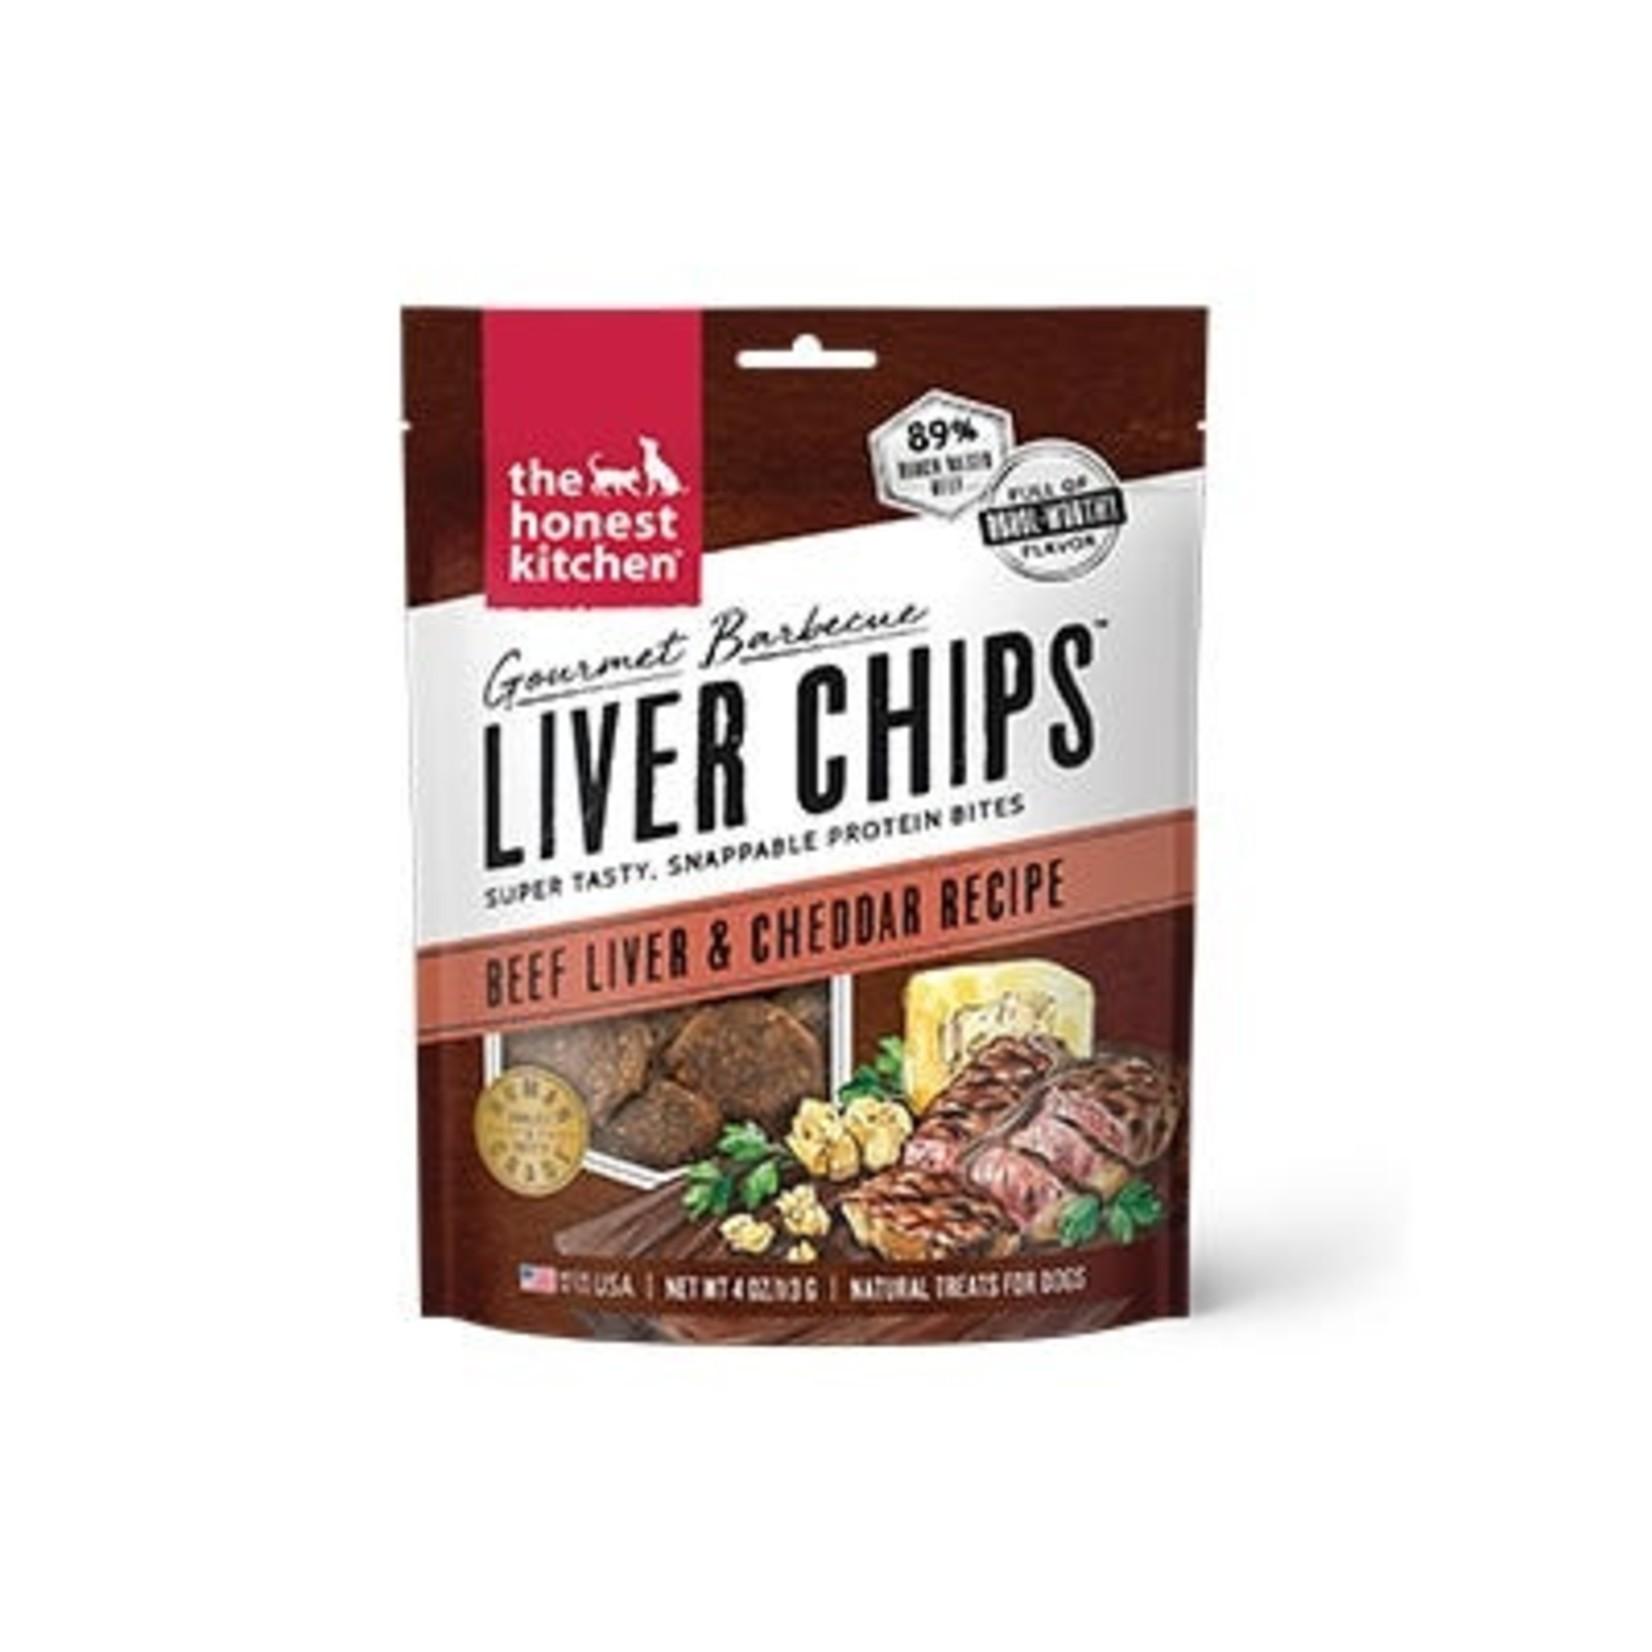 Honest Kitchen The Honest Kitchen Gourmet Barbecue Liver Chips Beef & Cheddar Dog Treats 4oz